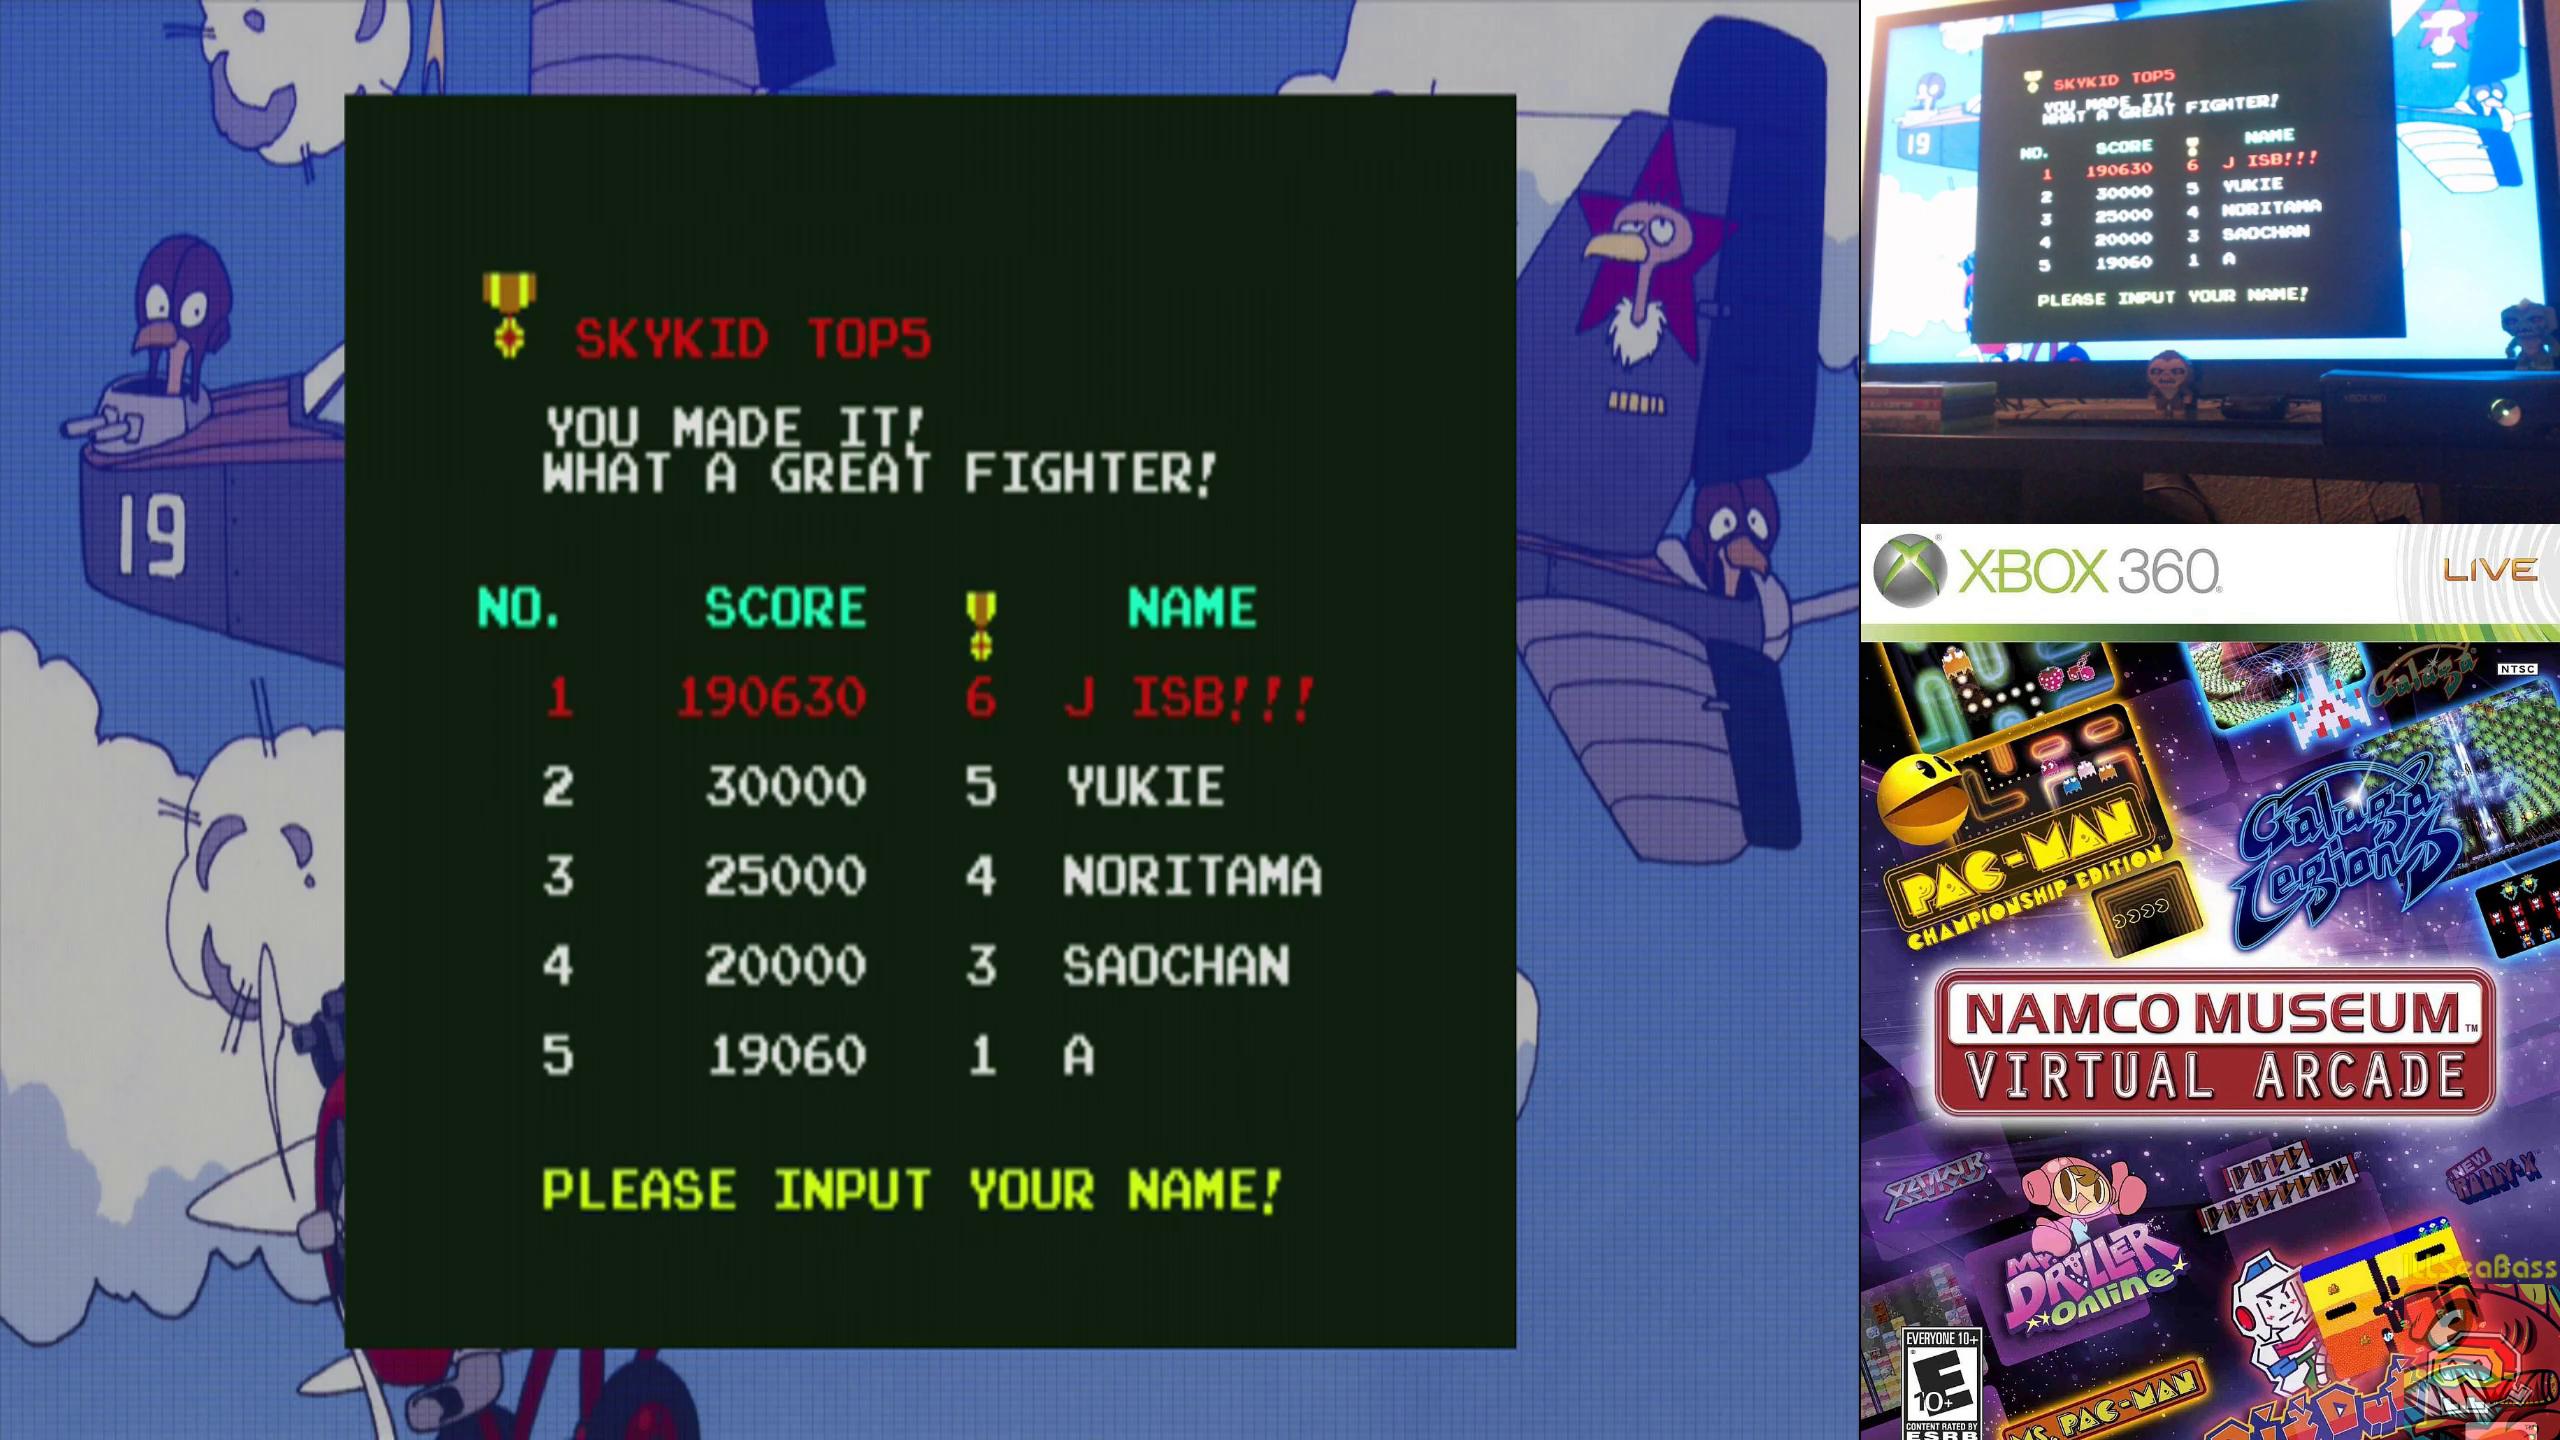 ILLSeaBass: Namco Muesum Virtual Arcade: Sky Kid Deluxe (Xbox 360) 190,630 points on 2019-10-10 12:43:55